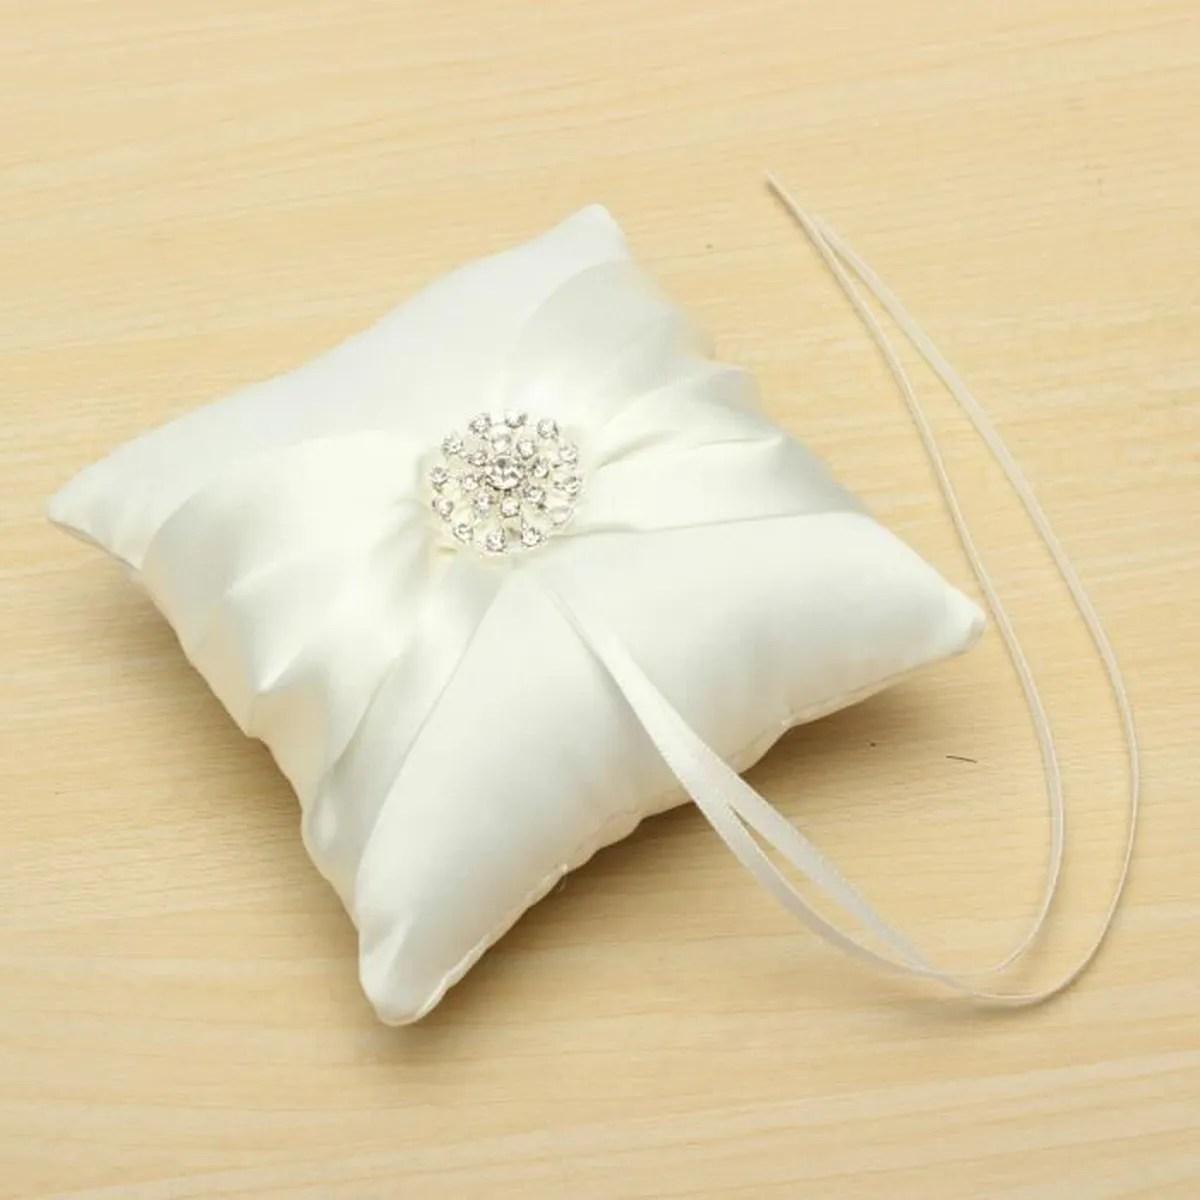 oreiller anneau coussin alliance strass satin ruban noeud papillon mariage decor blanc